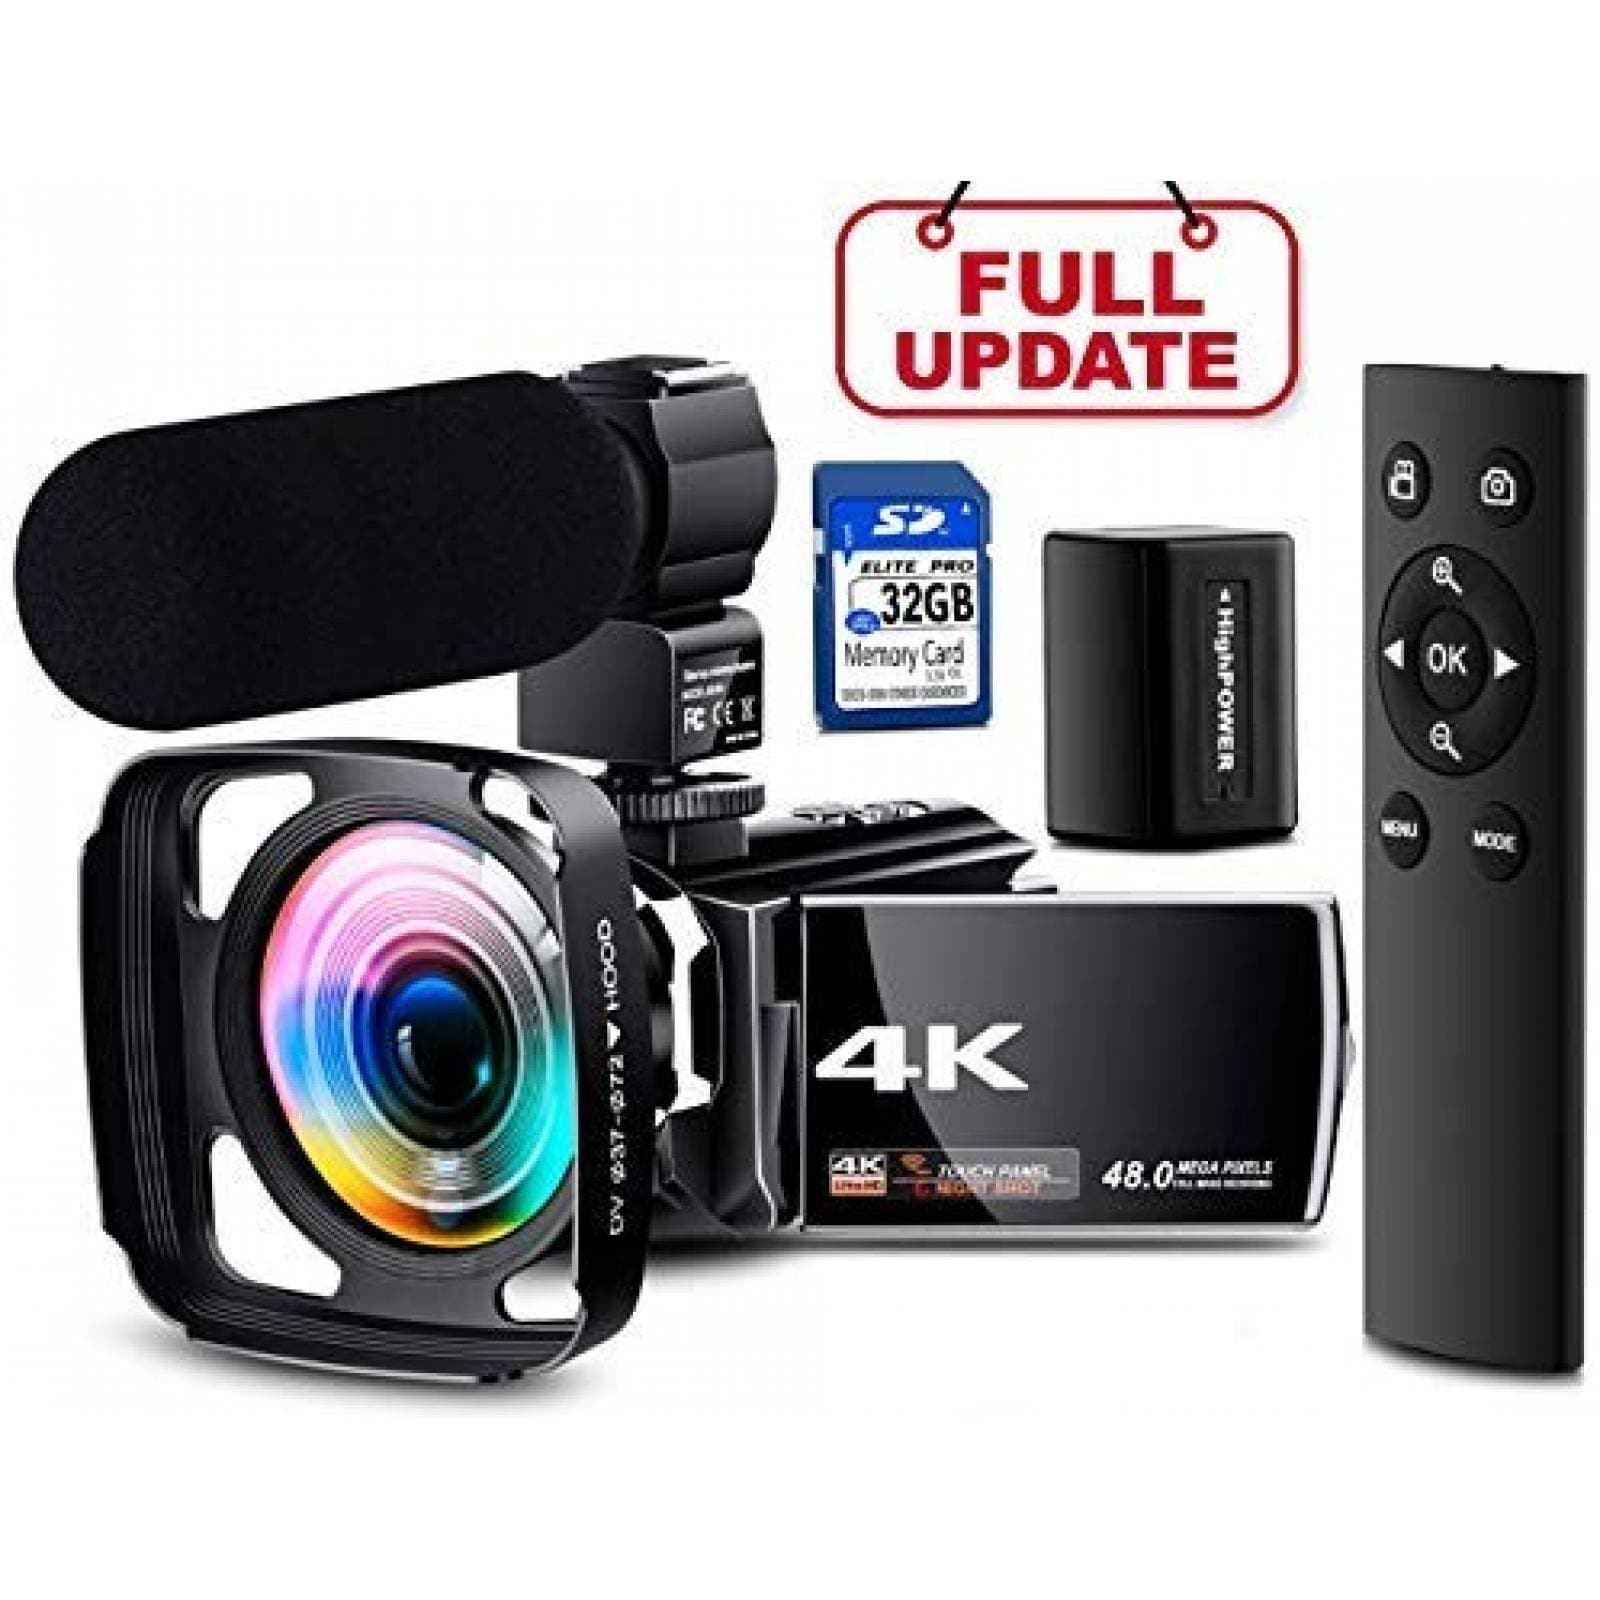 Cámara de video NAPATEK HD 4K 60FPS gran angular -Negro